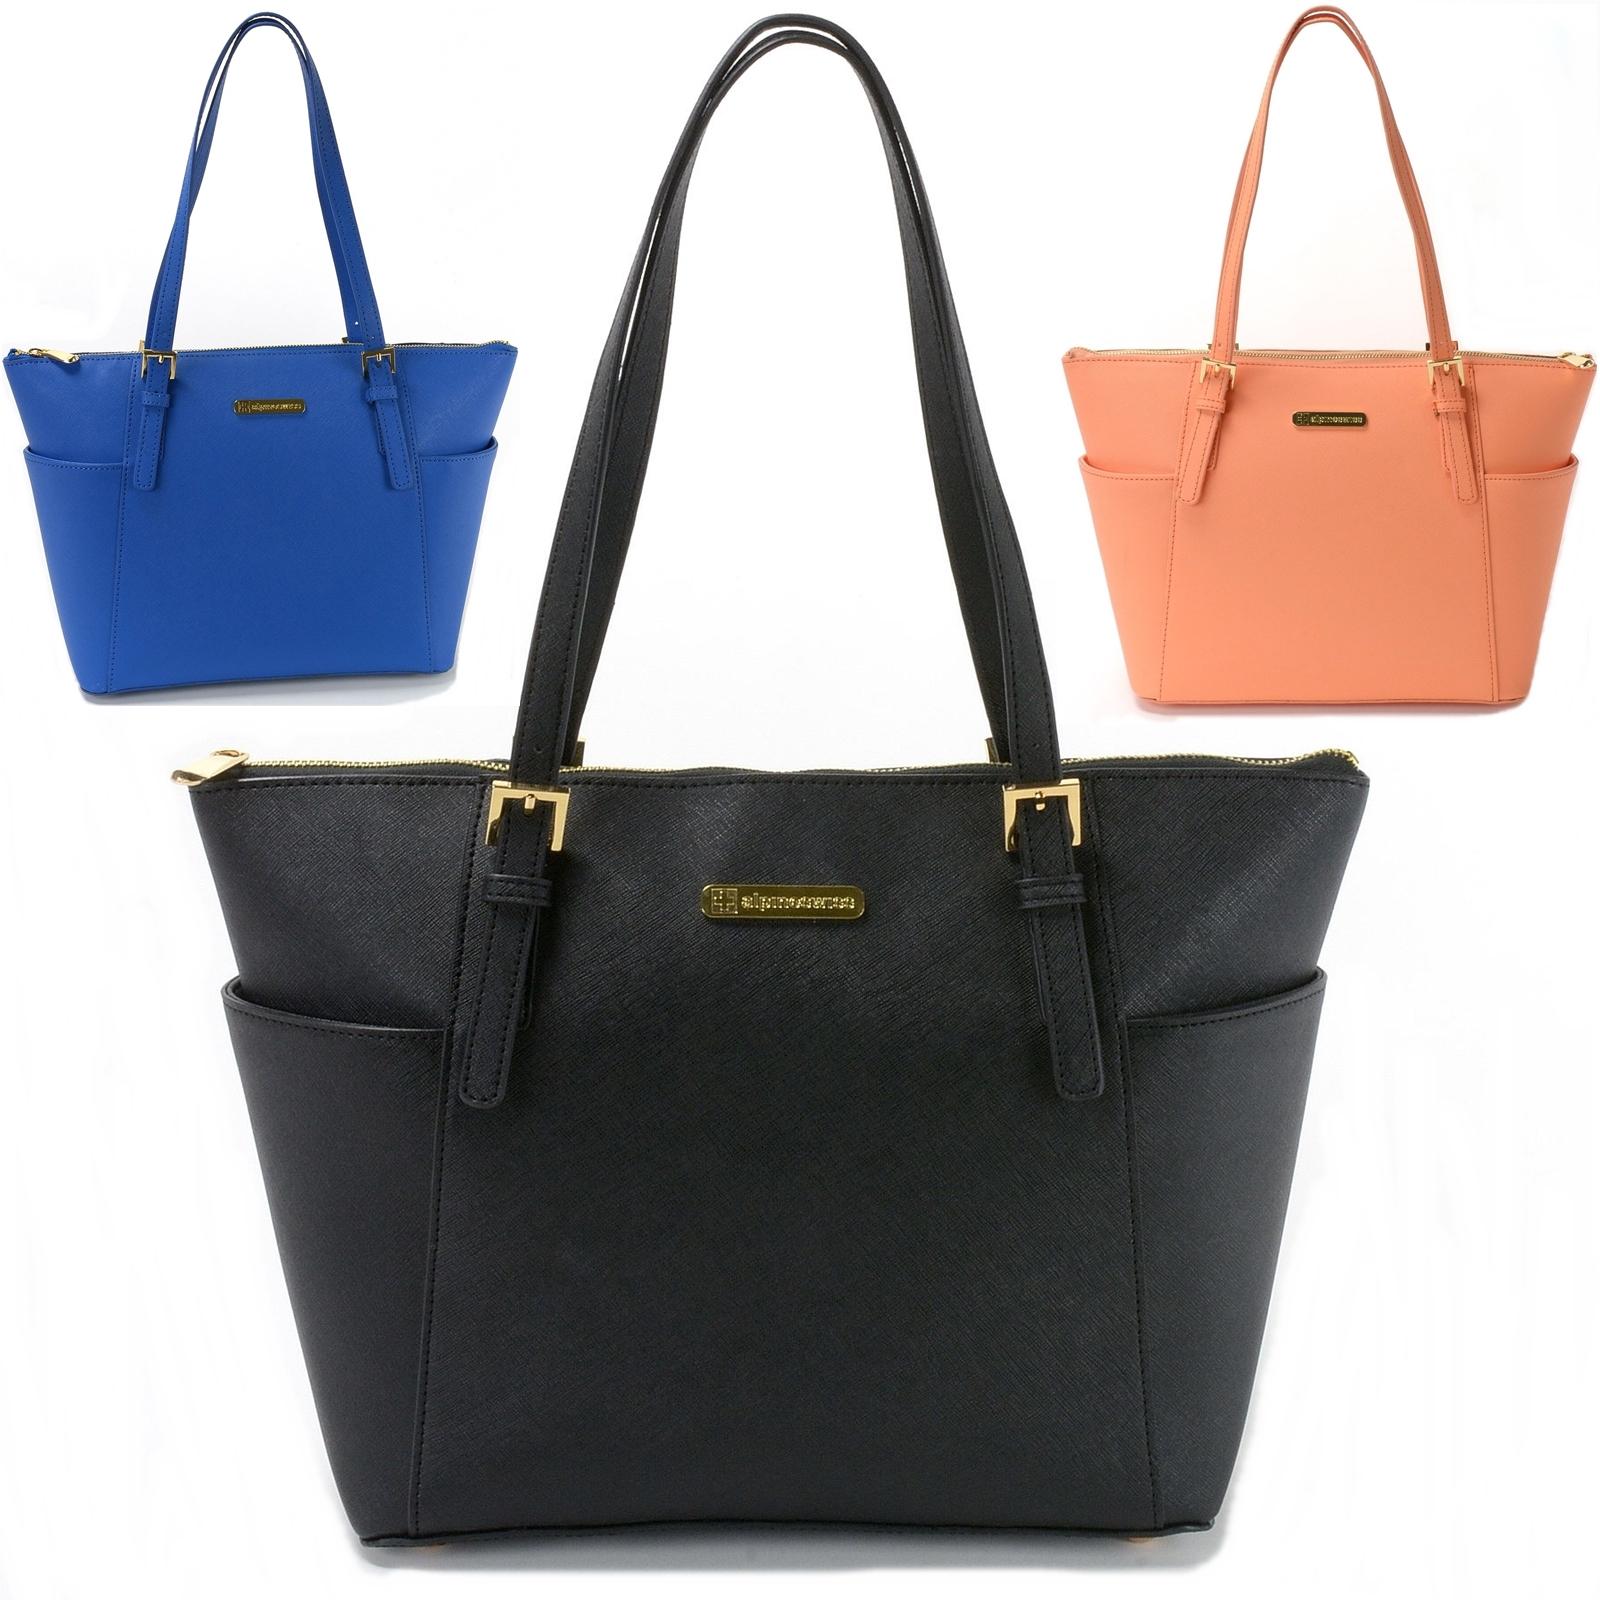 Alpine Swiss Women's Ebro Saffiano Tote Bag Travel Handbag Purse ...